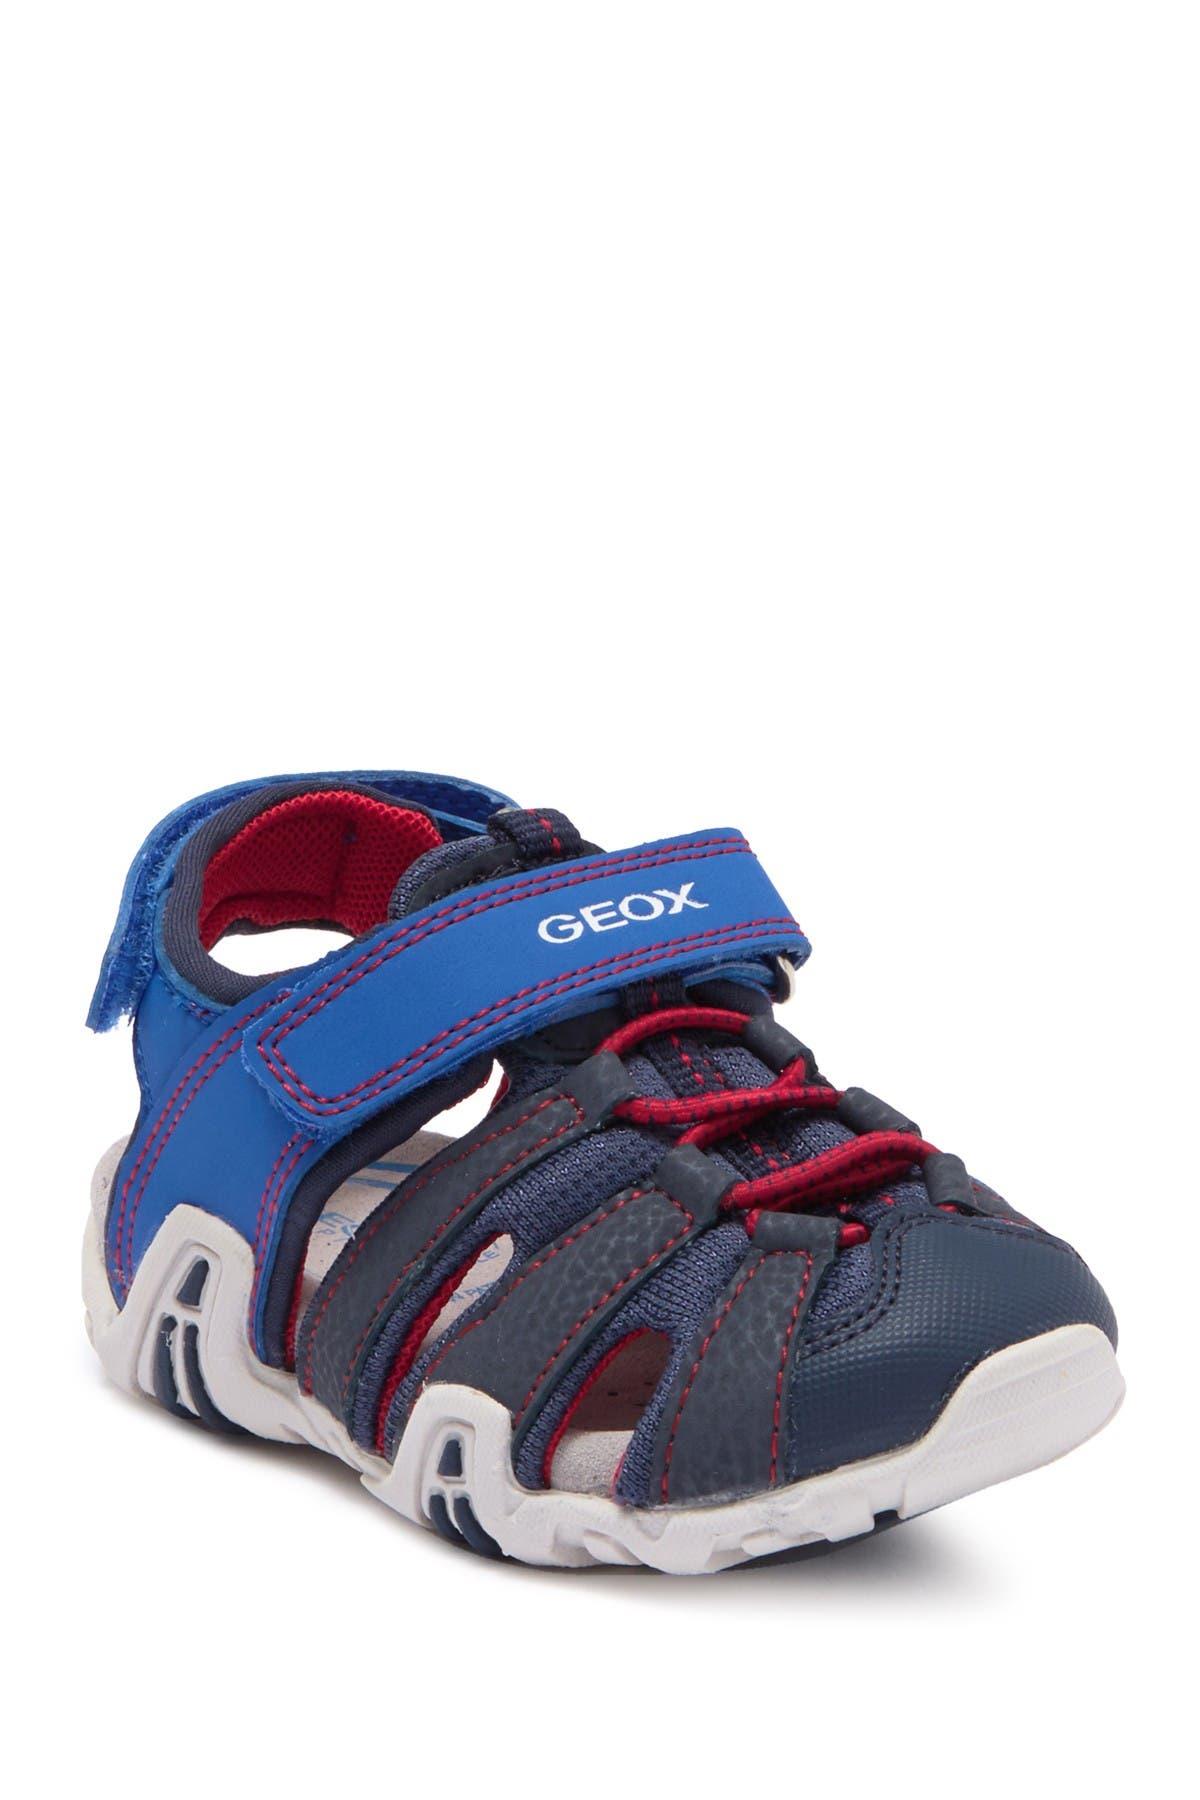 Image of GEOX Kraze 59 Sandal